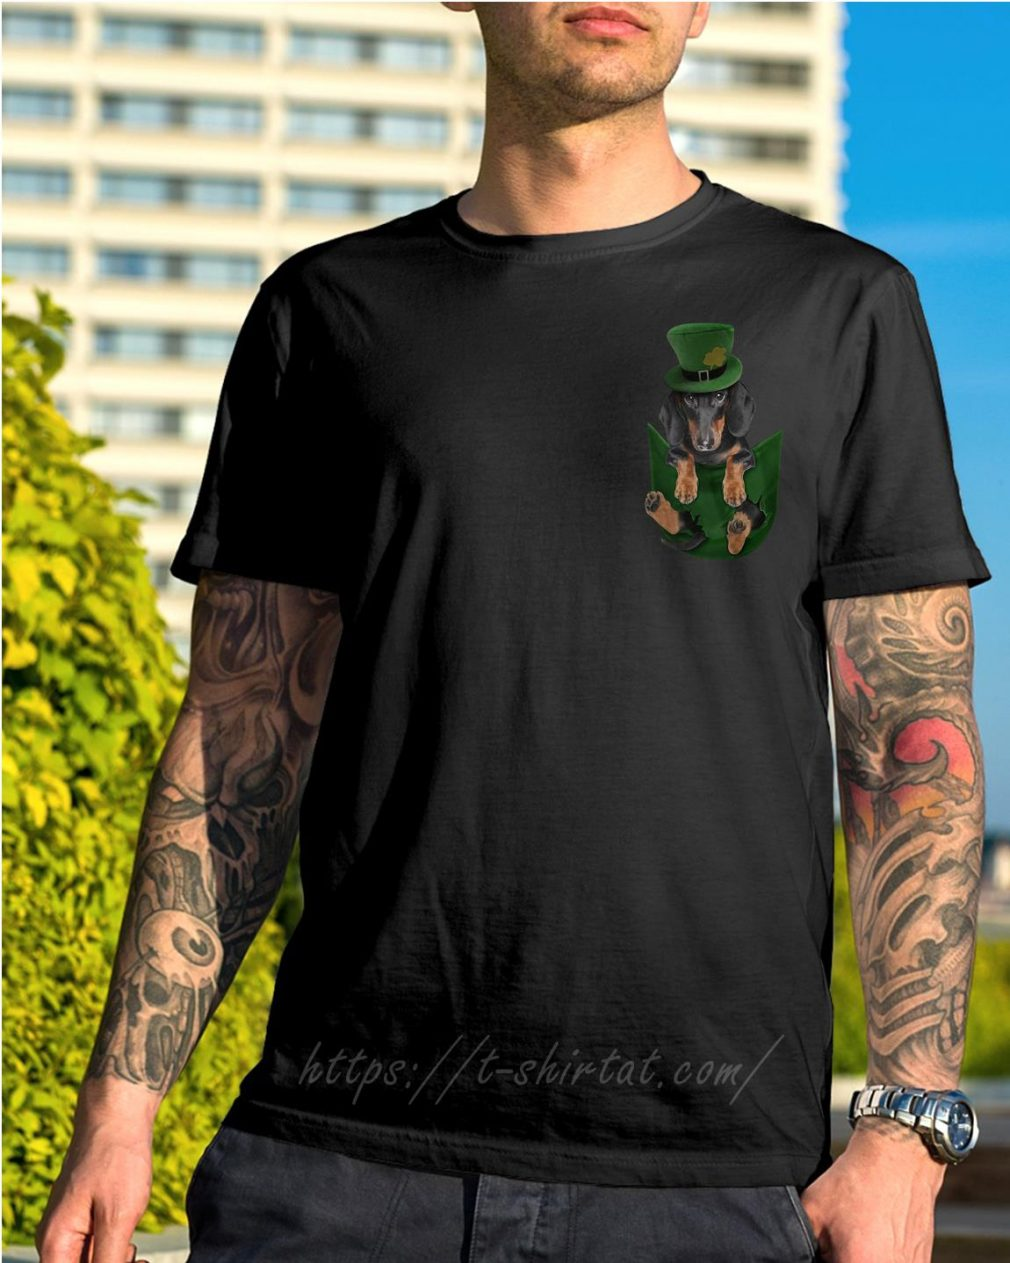 St Patrick's Dachshund in a pocket shirt